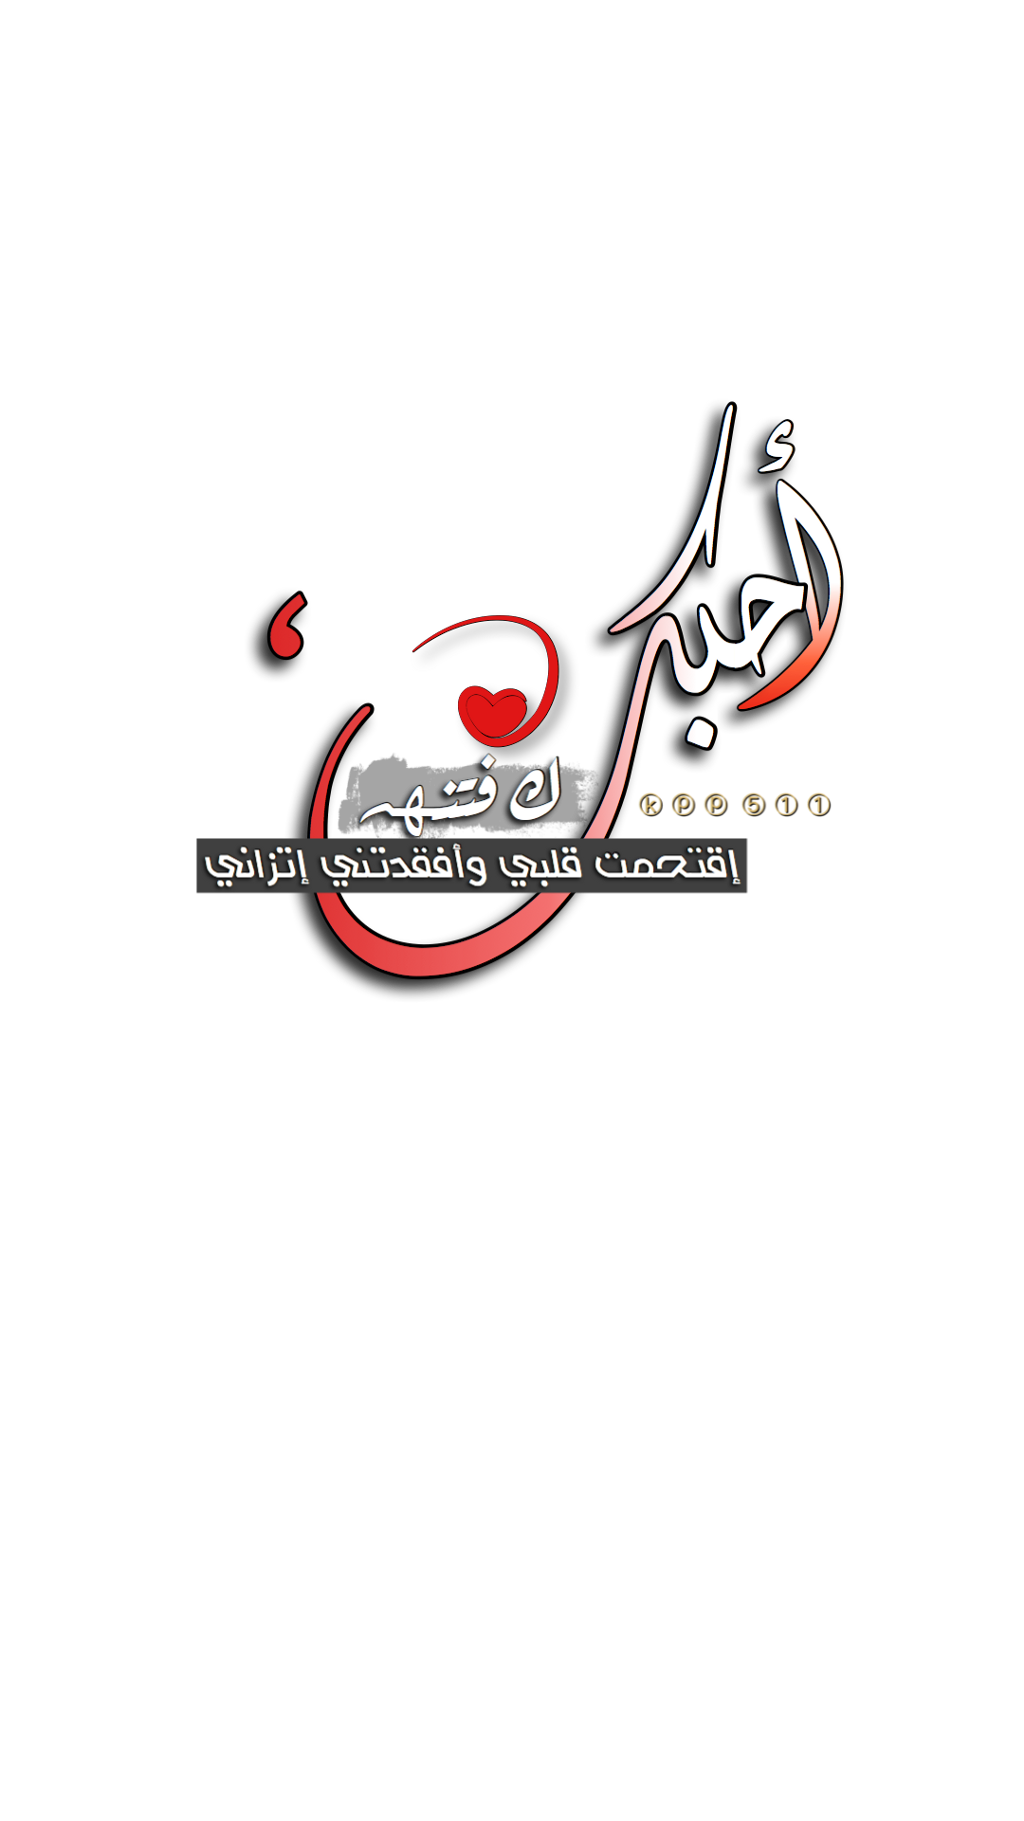 #حب #freetoedit